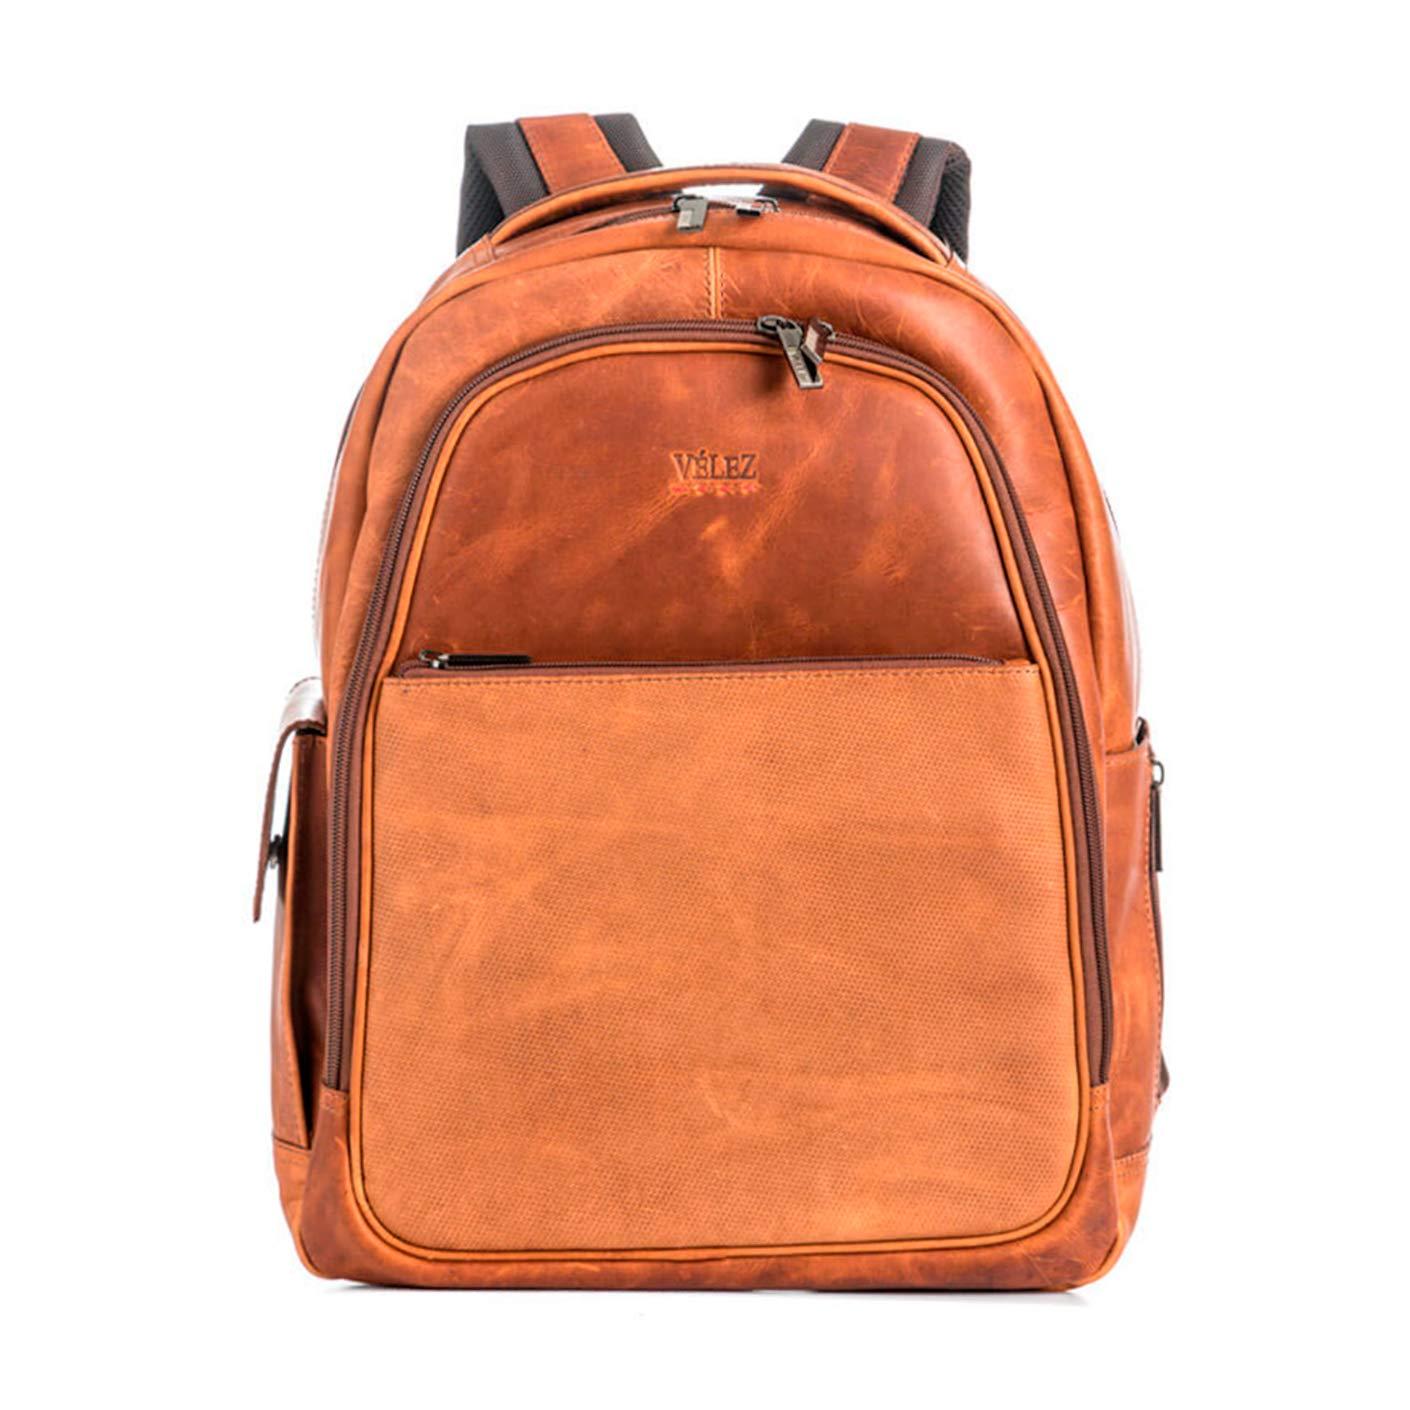 Amazon.com | Velez Genuine Leather Backpack for Men Bolso en Cuero de Hombre Brown | Casual Daypacks